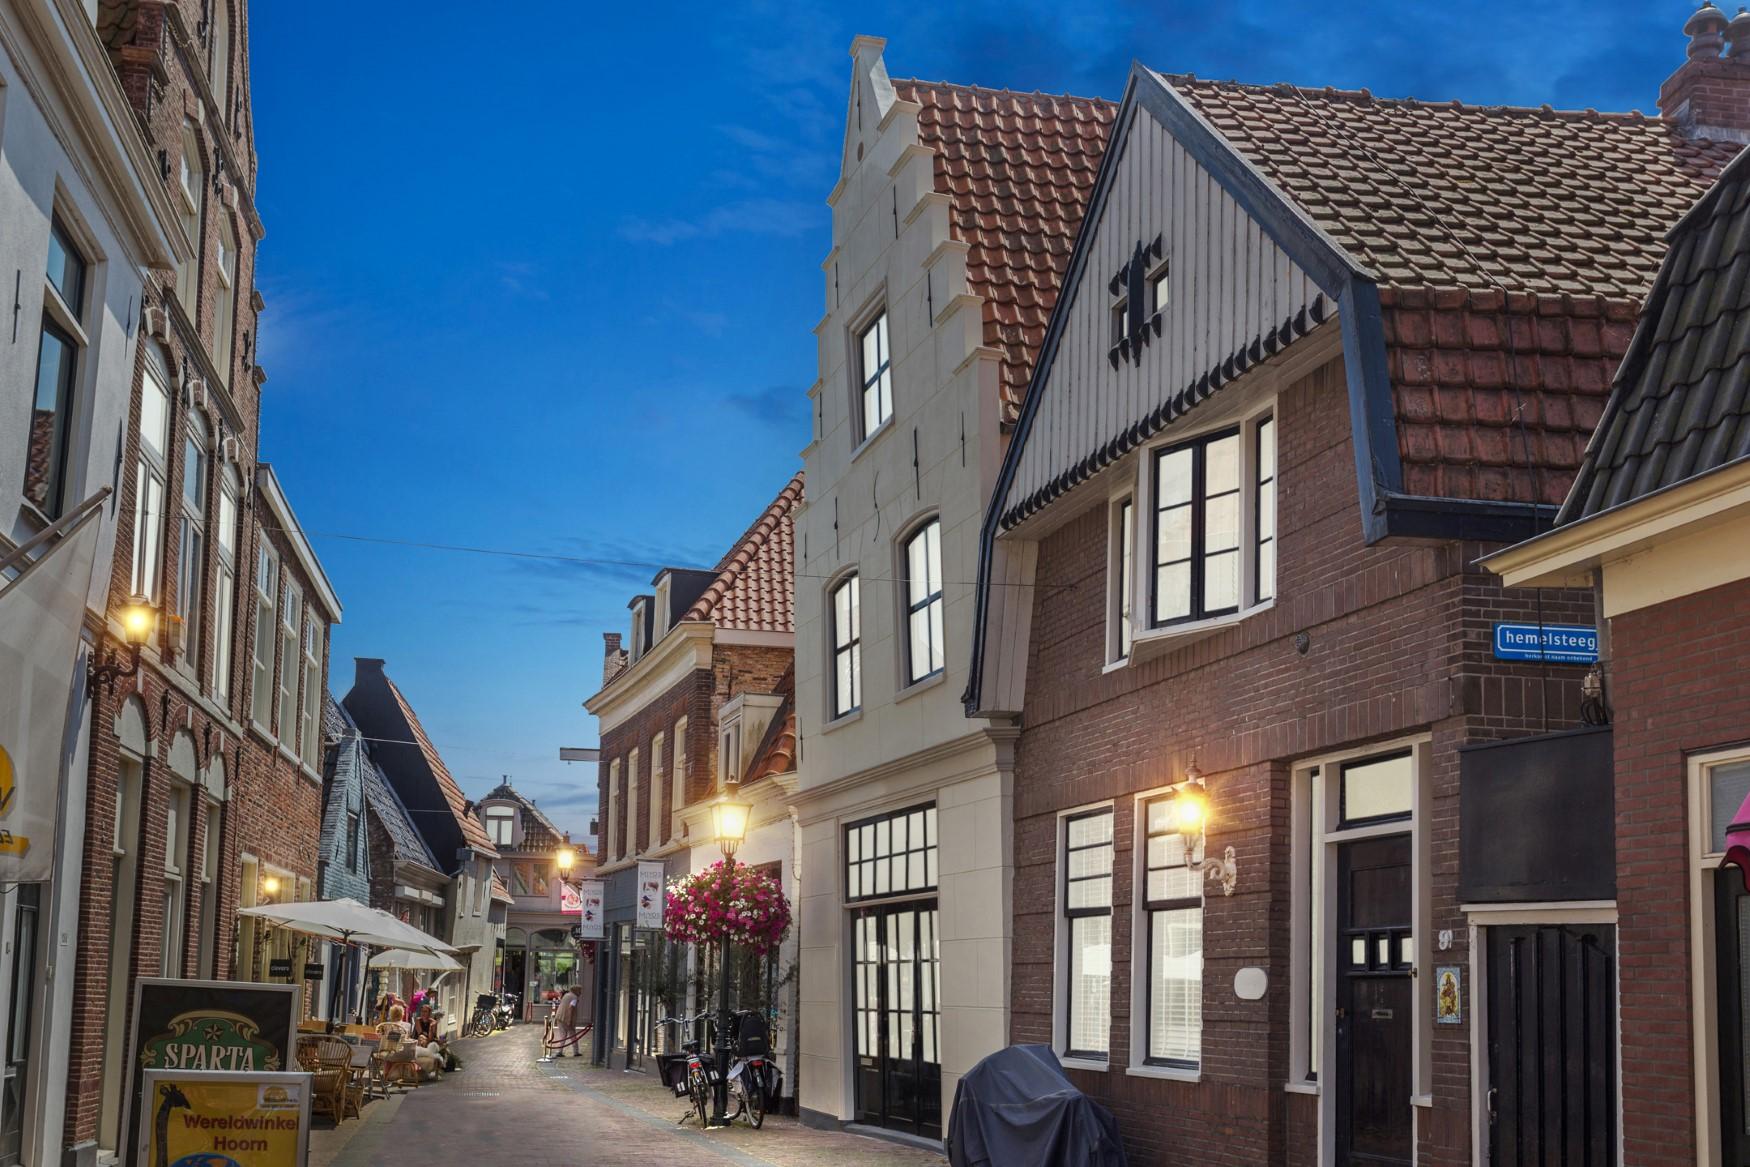 6d0e0e4fc18 VERKOCHT: Kruisstraat 7, Hoorn - Westfries Goed Makelaars & Adviseurs